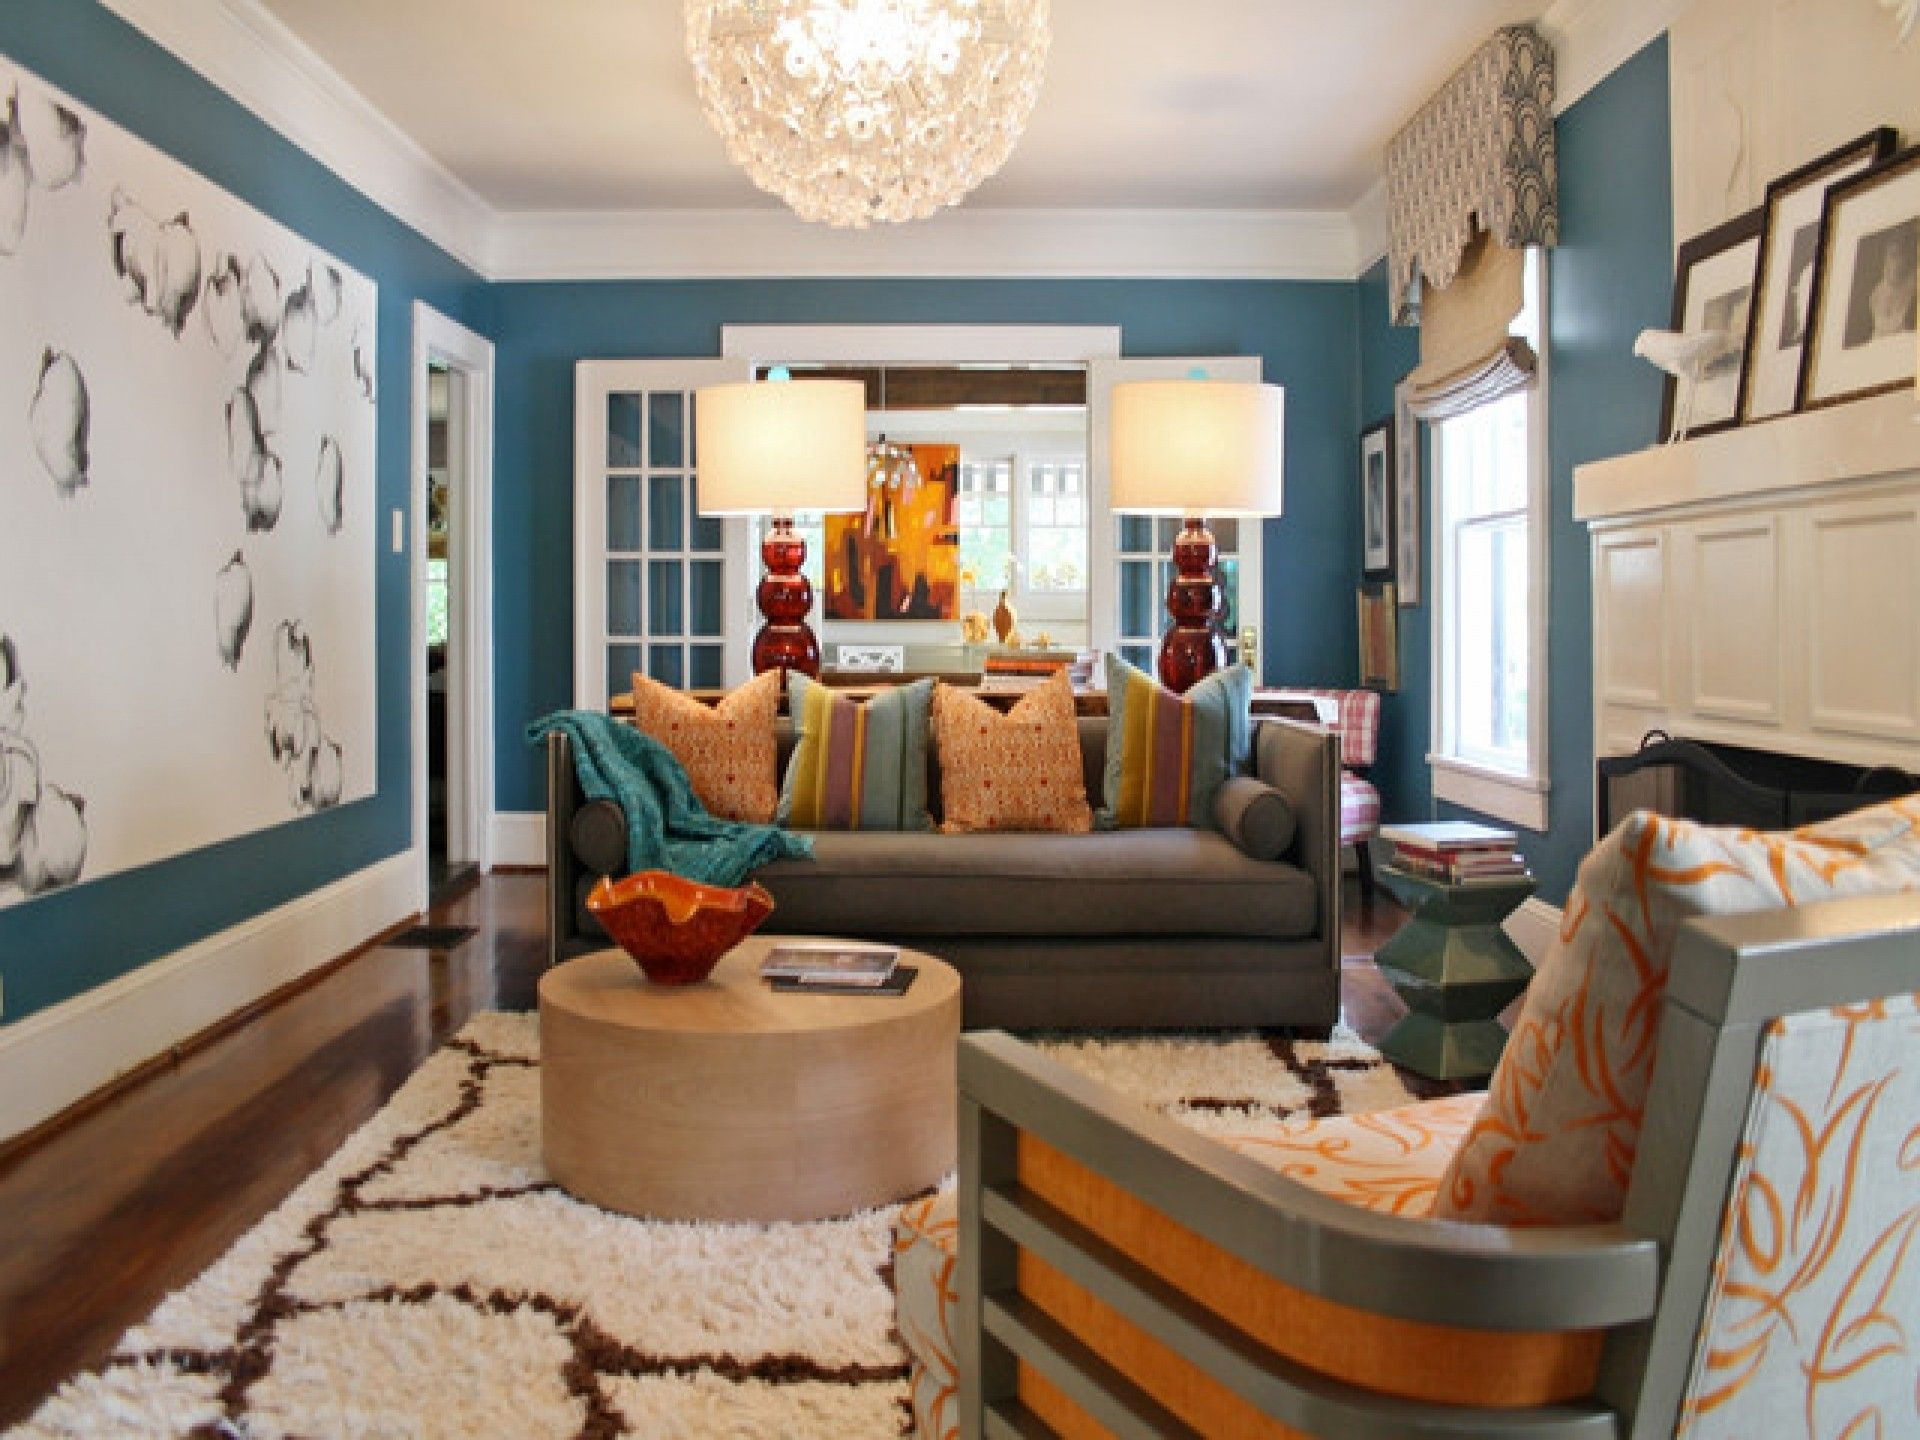 Good Color For Living Room Walls - Inarace.net